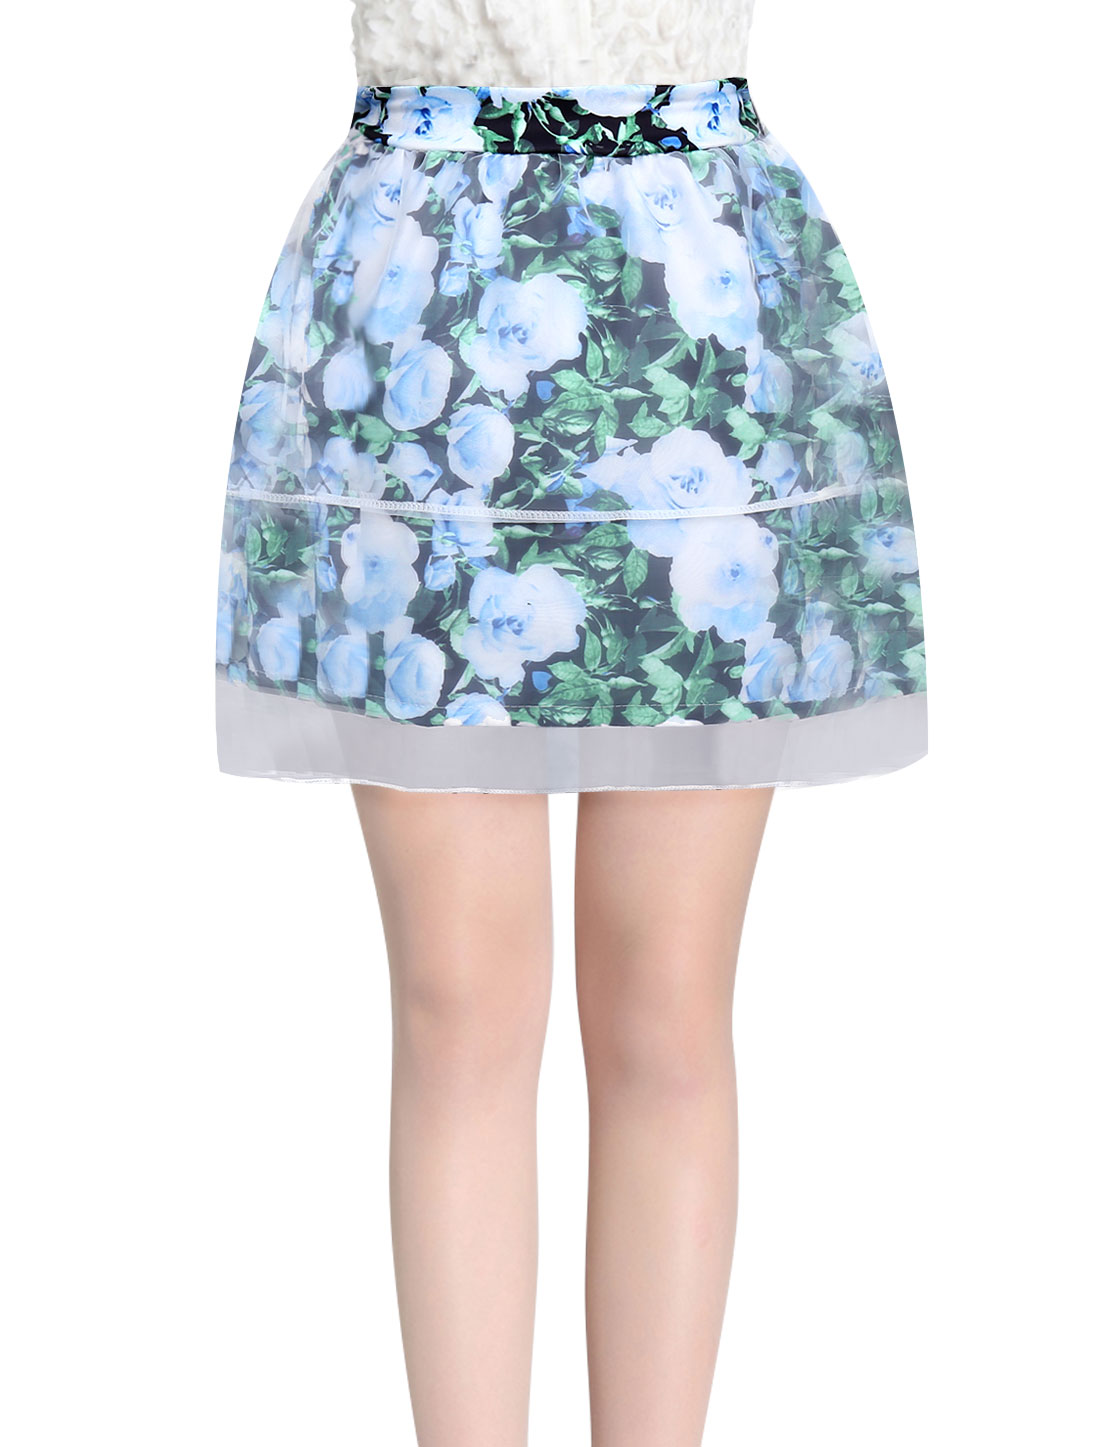 Women Elastic Waist Floral Prints Mesh Overlay Skirt Sky Blue XS